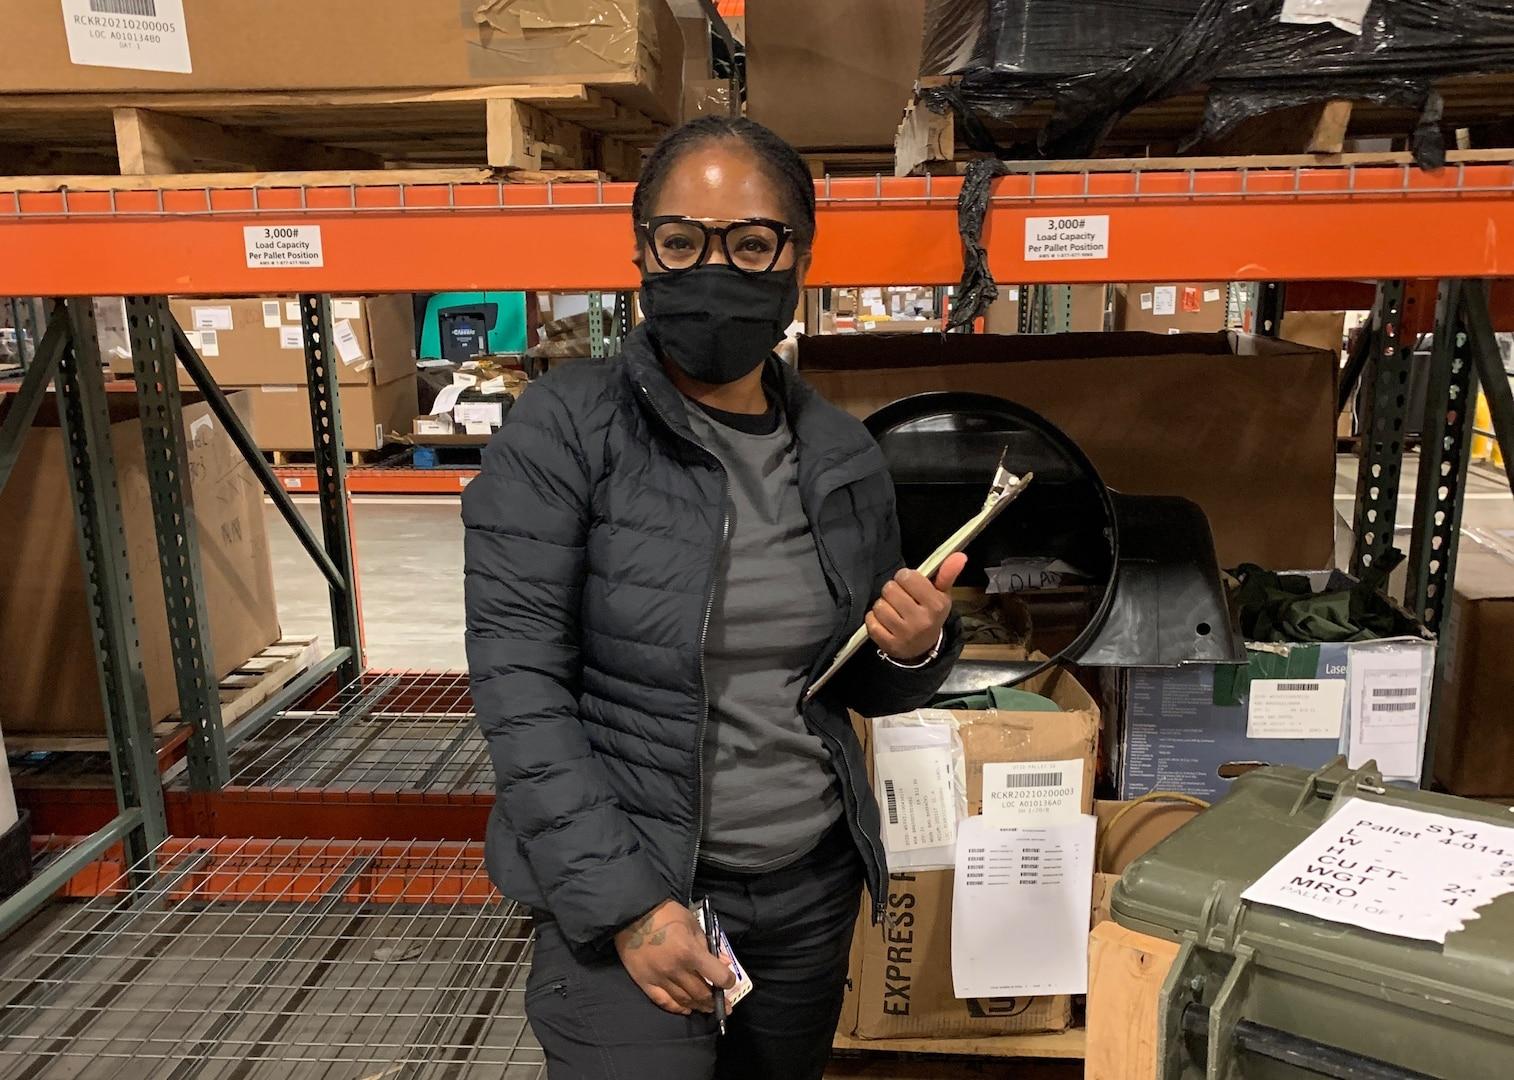 Shontavia Ortega examining items in a warehouse